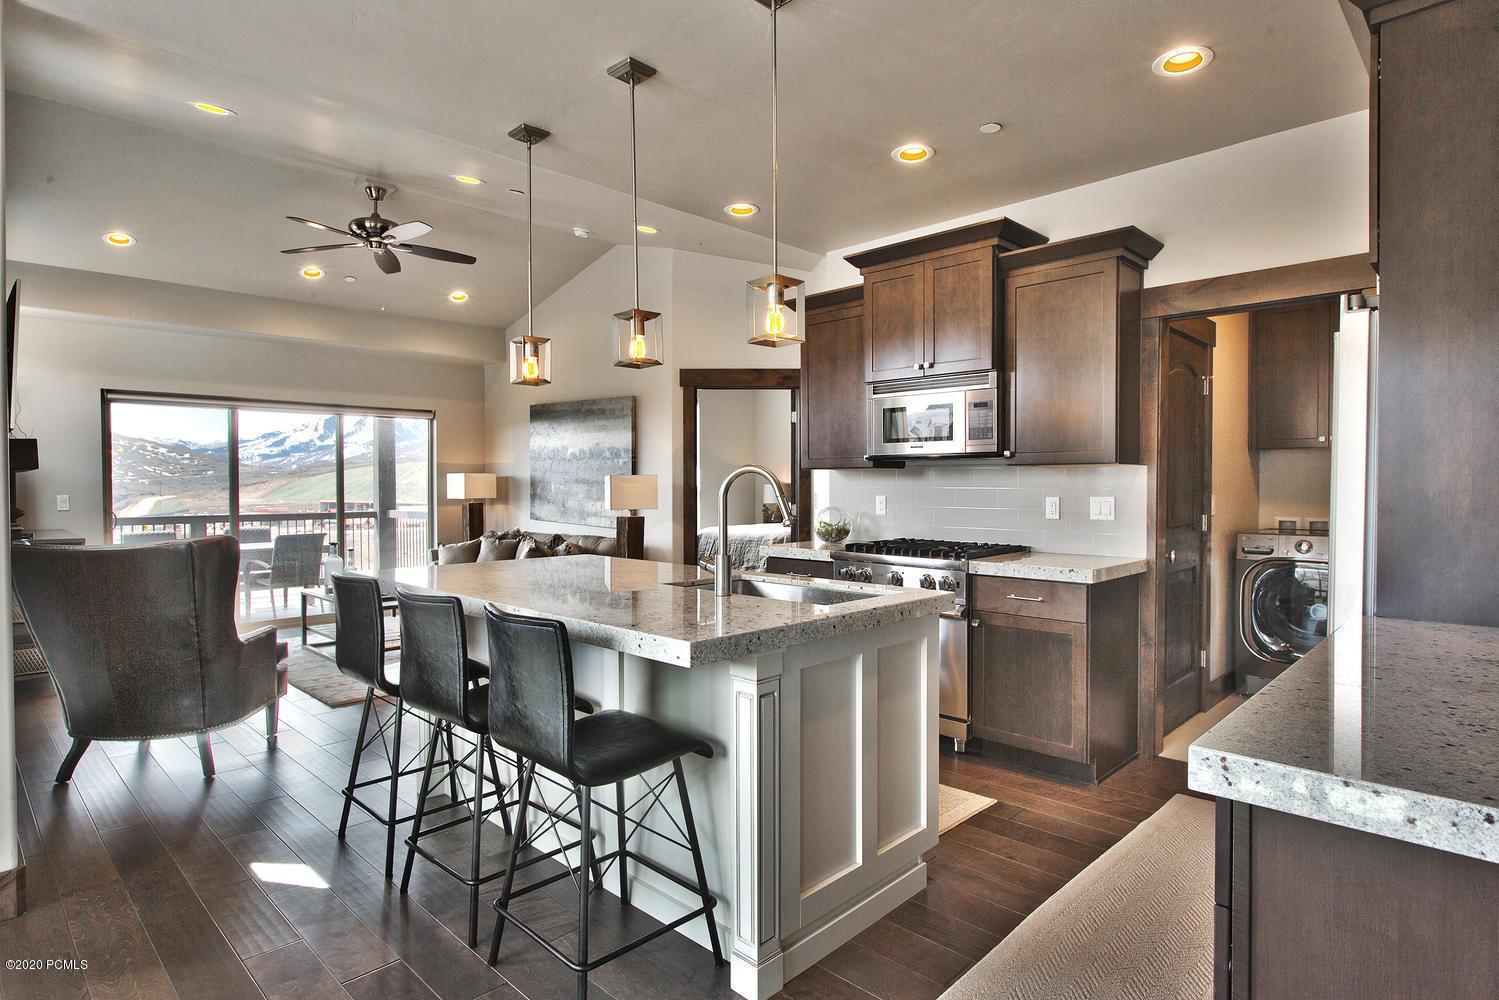 14545 Bronte Court, Heber City, Utah 84032, 3 Bedrooms Bedrooms, ,4 BathroomsBathrooms,Condominium,For Sale,Bronte,12002958